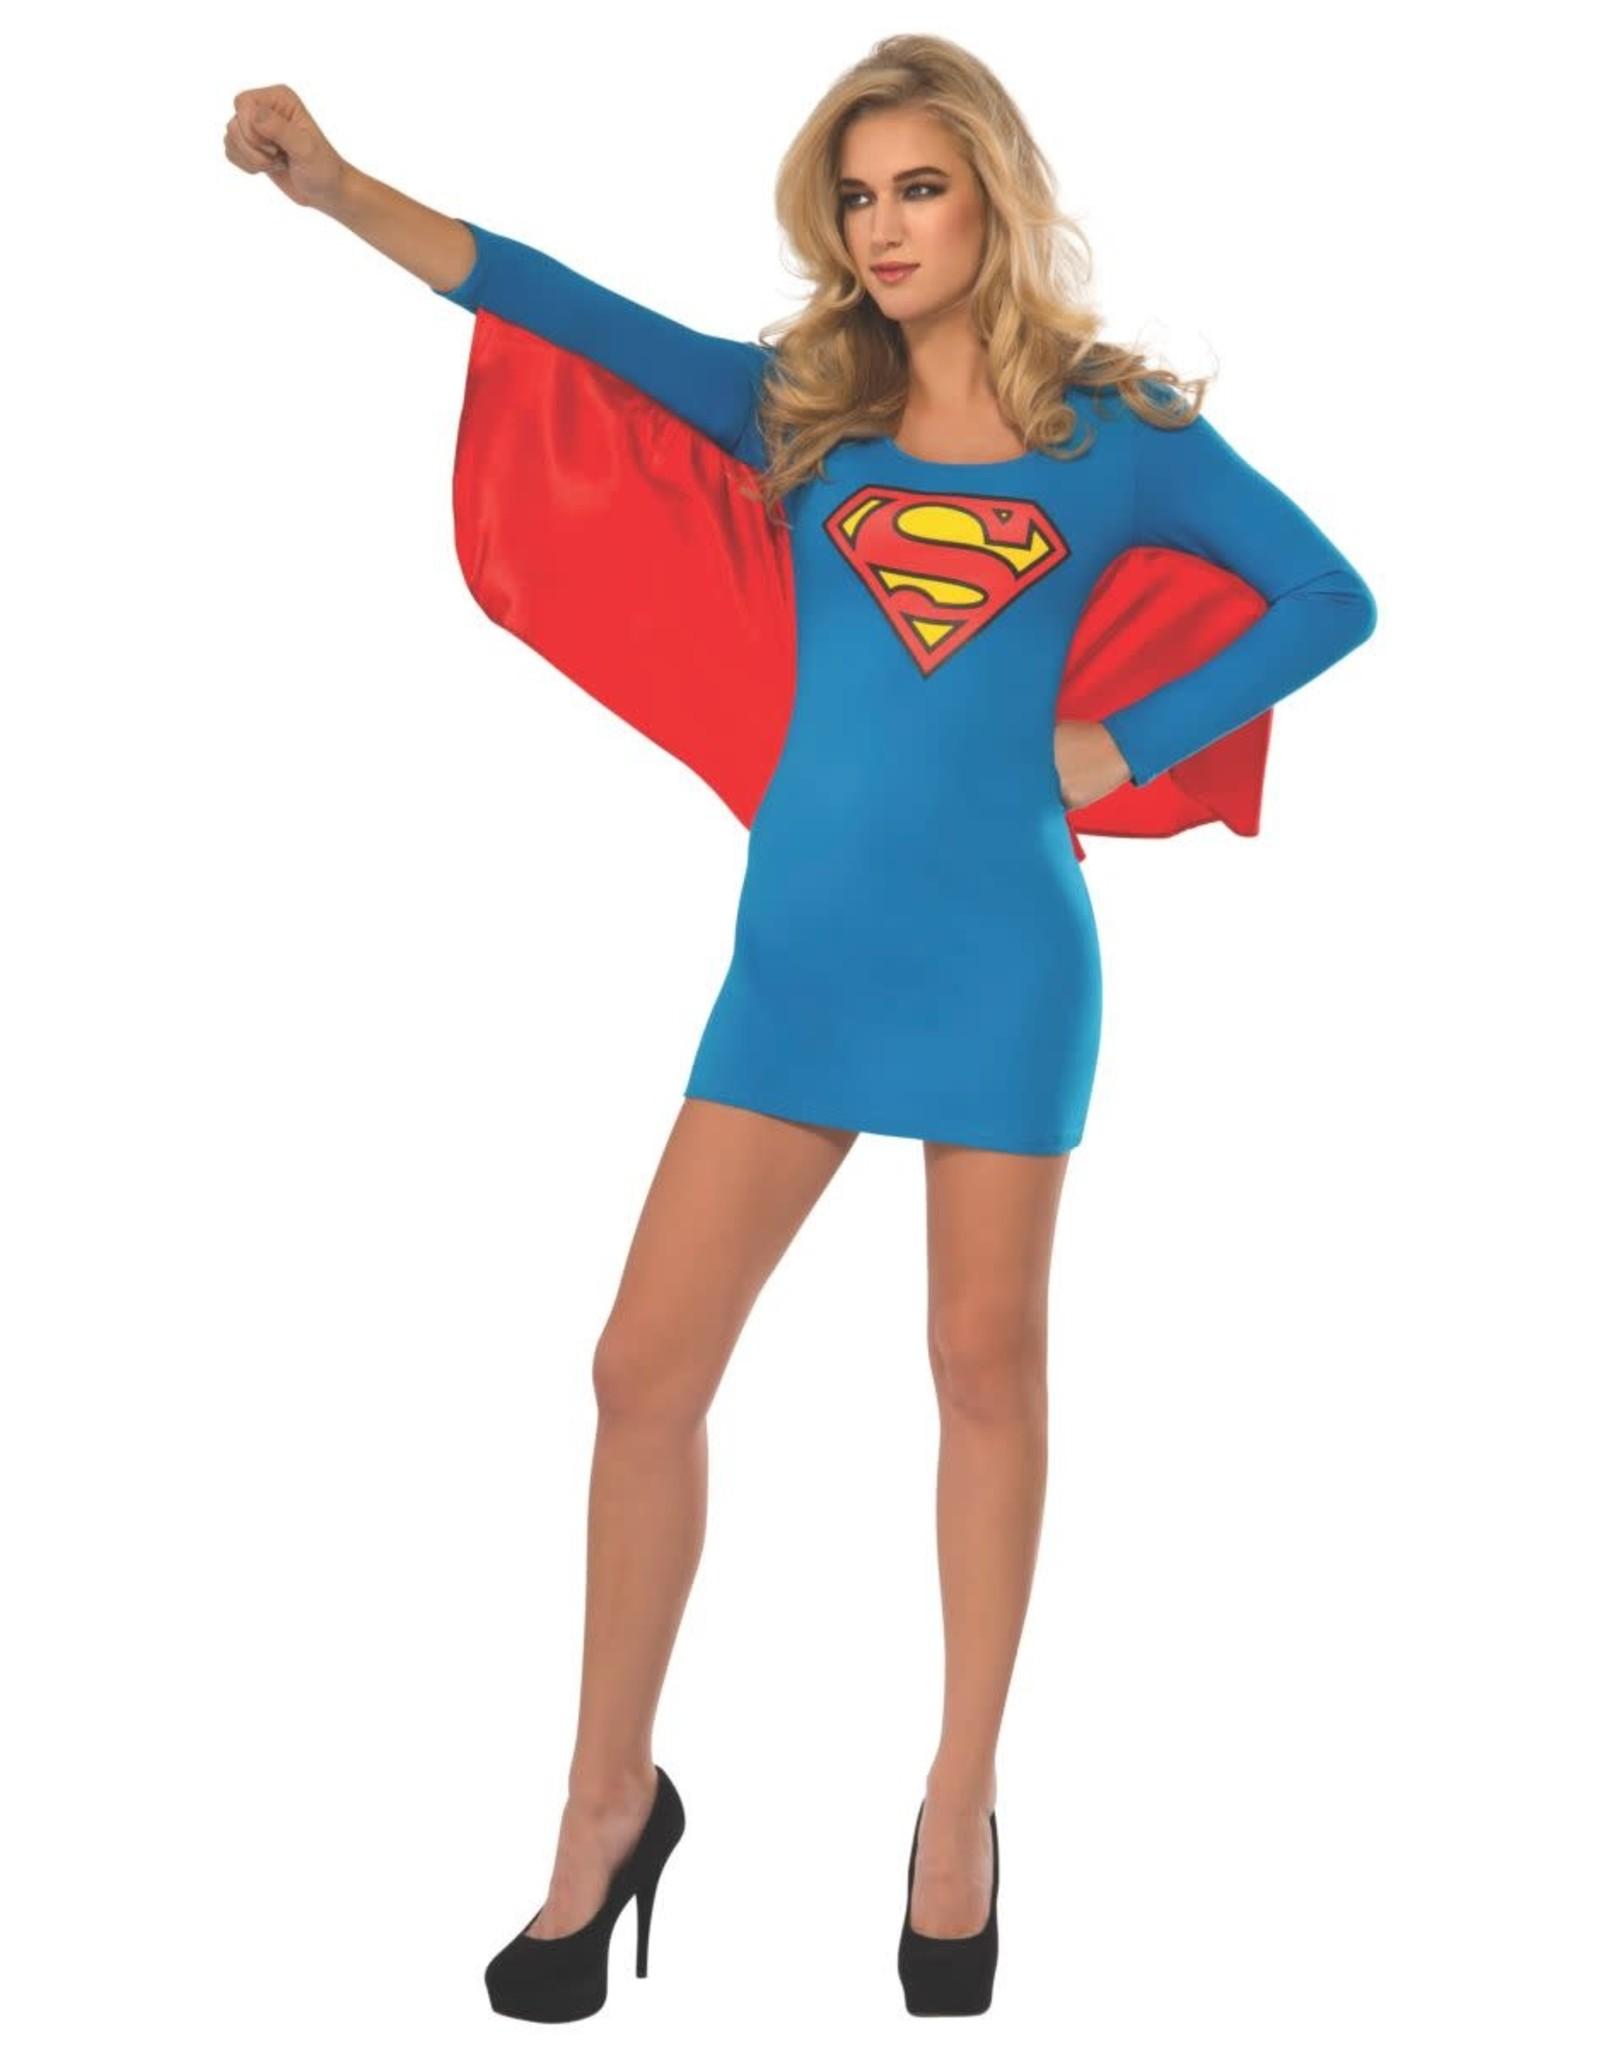 Rubies Costume Supergirl Wing Dress